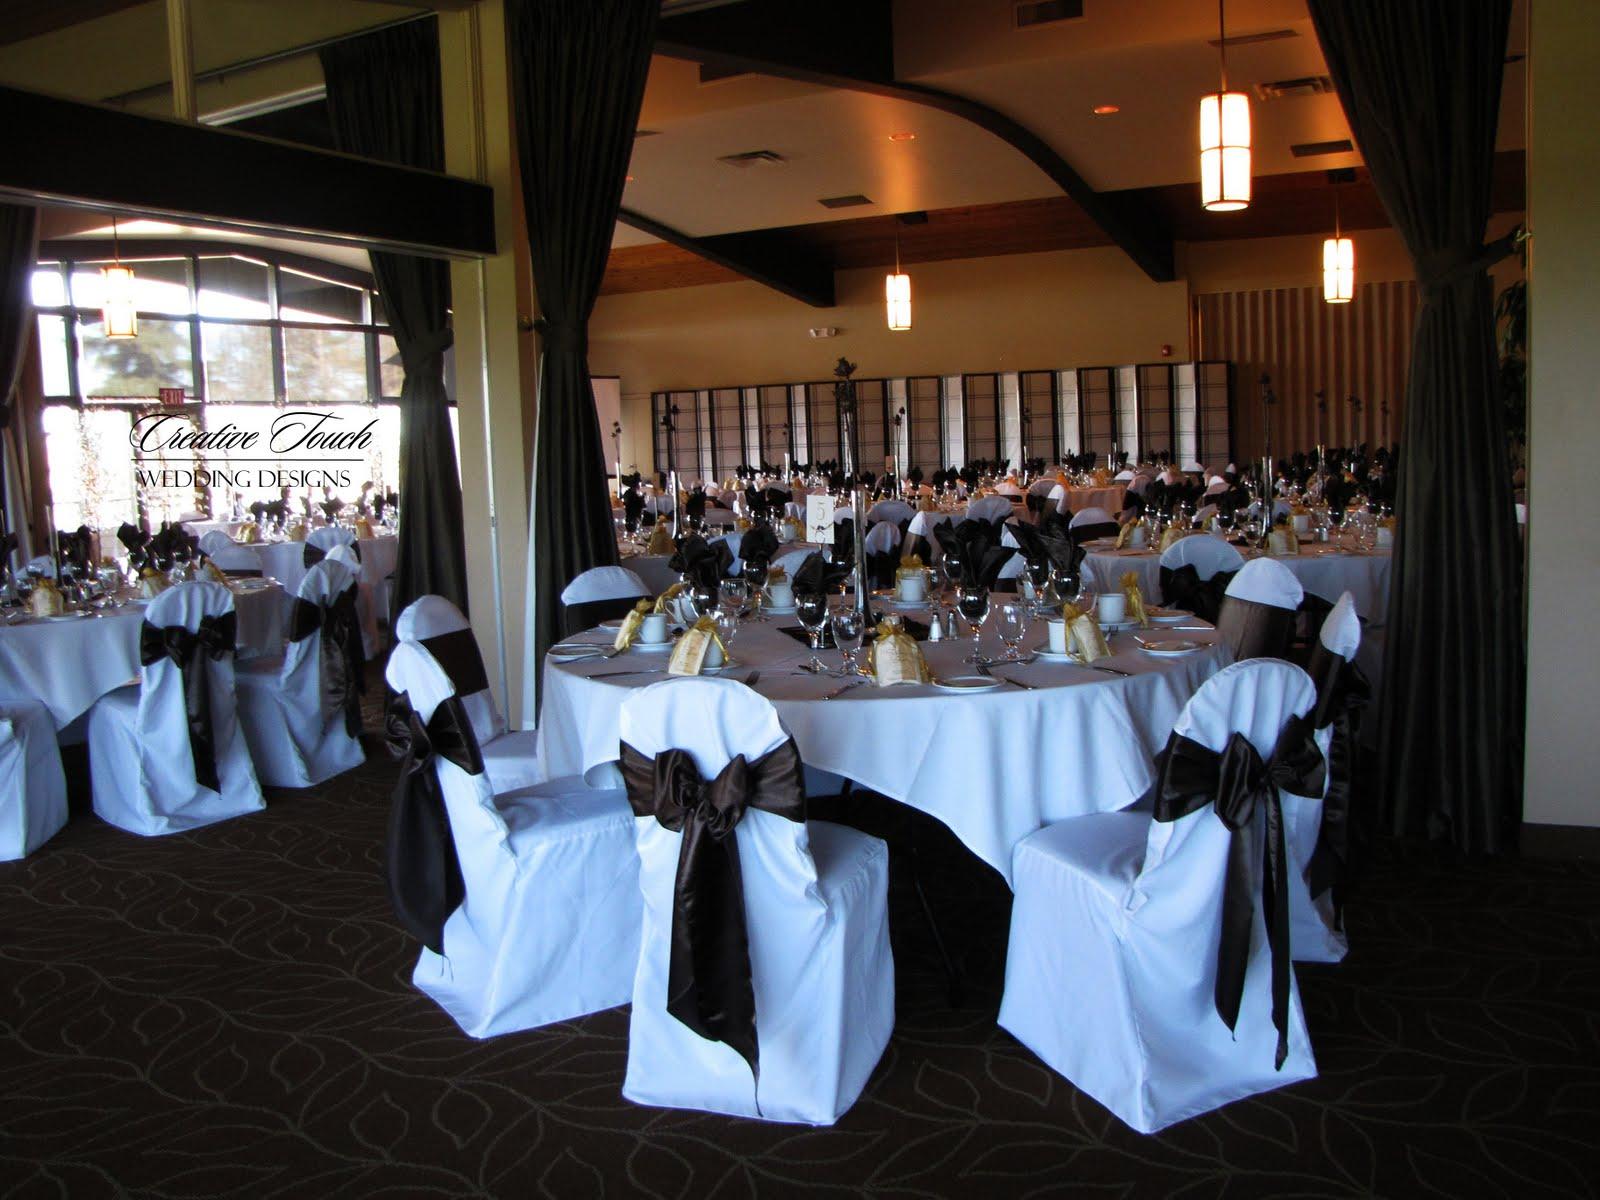 set up wedding decor that